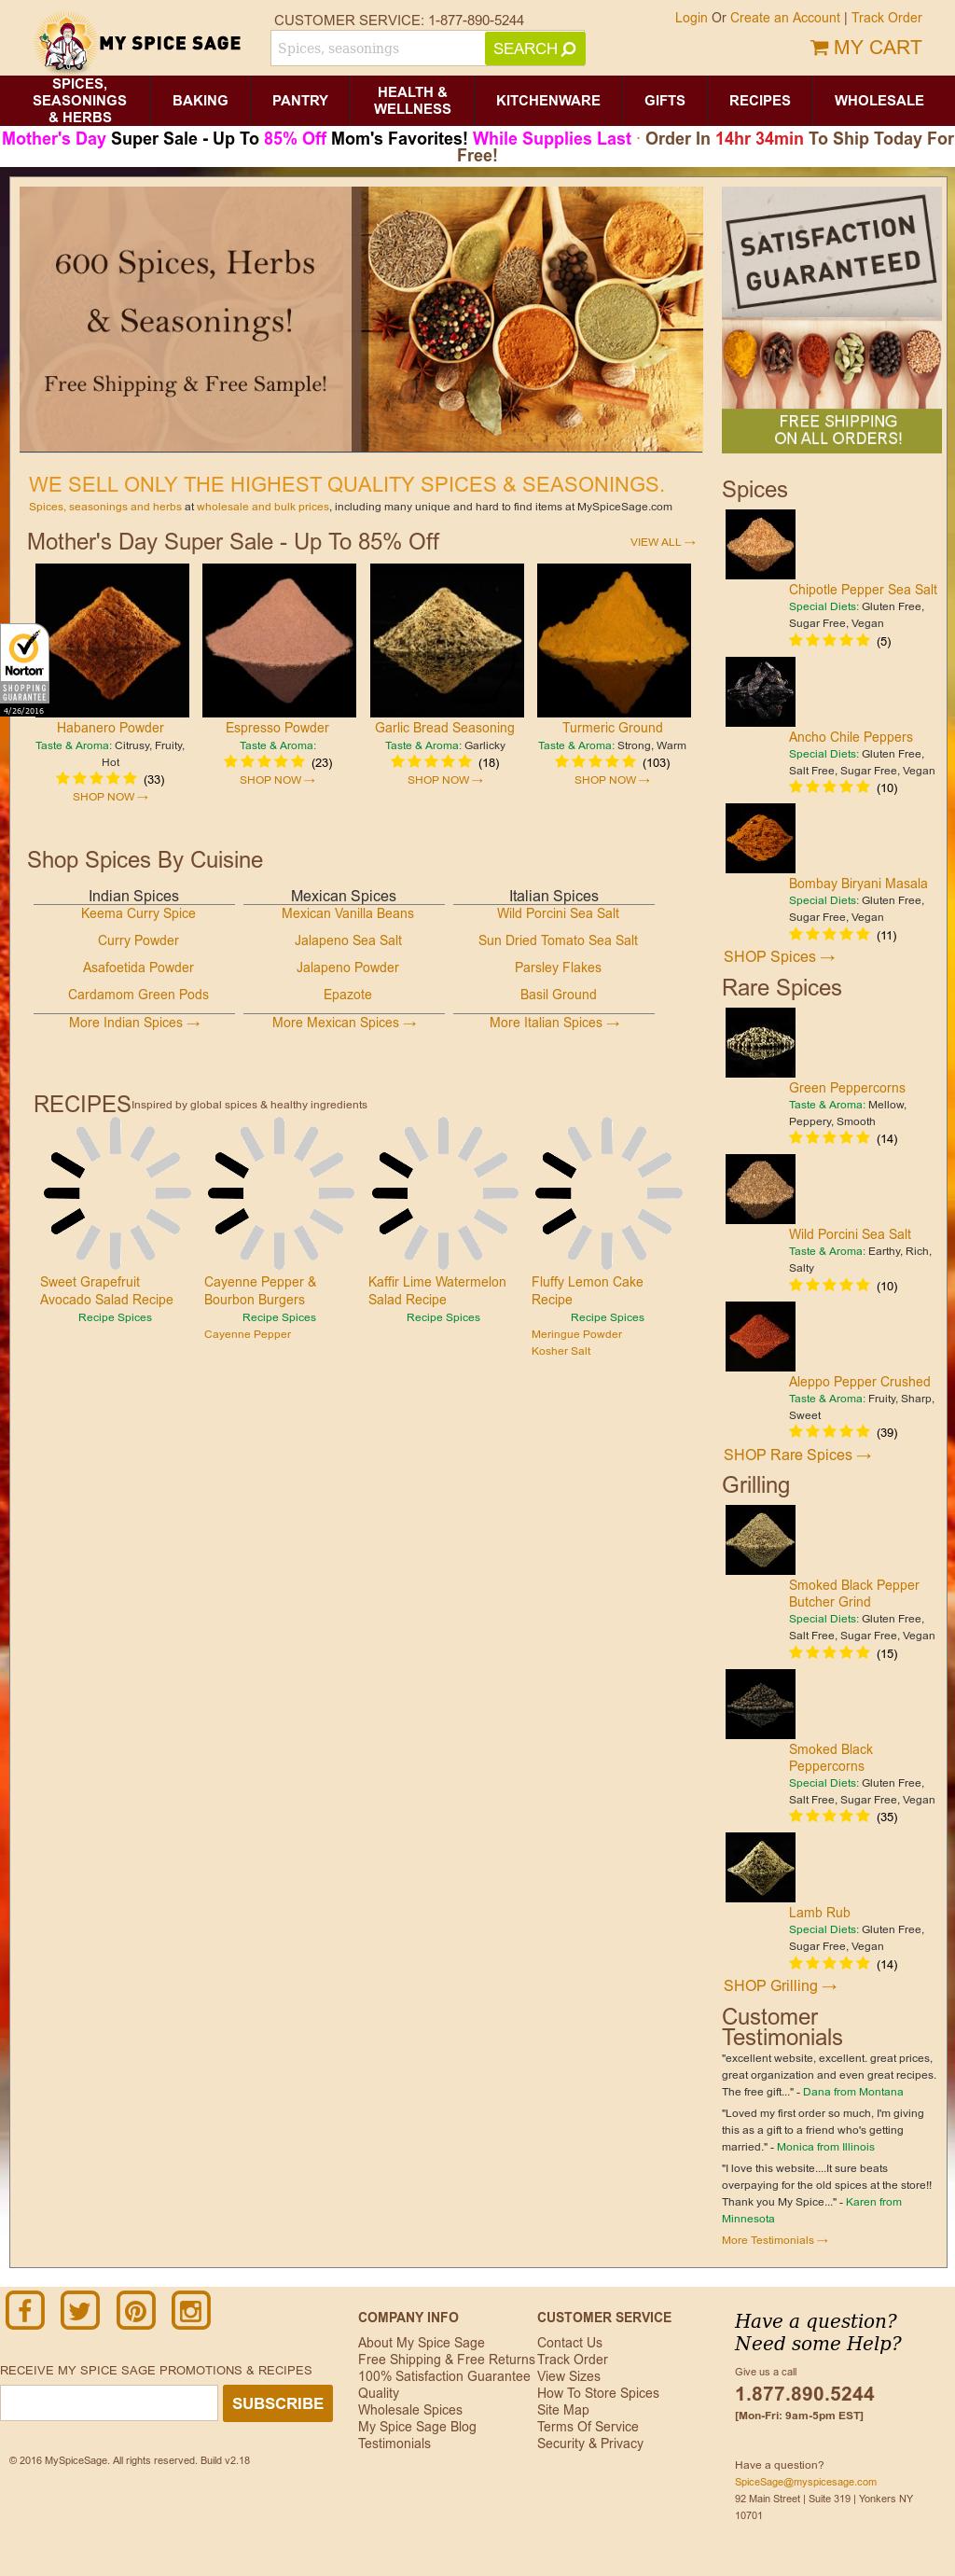 MySpiceSage Competitors, Revenue and Employees - Owler Company Profile